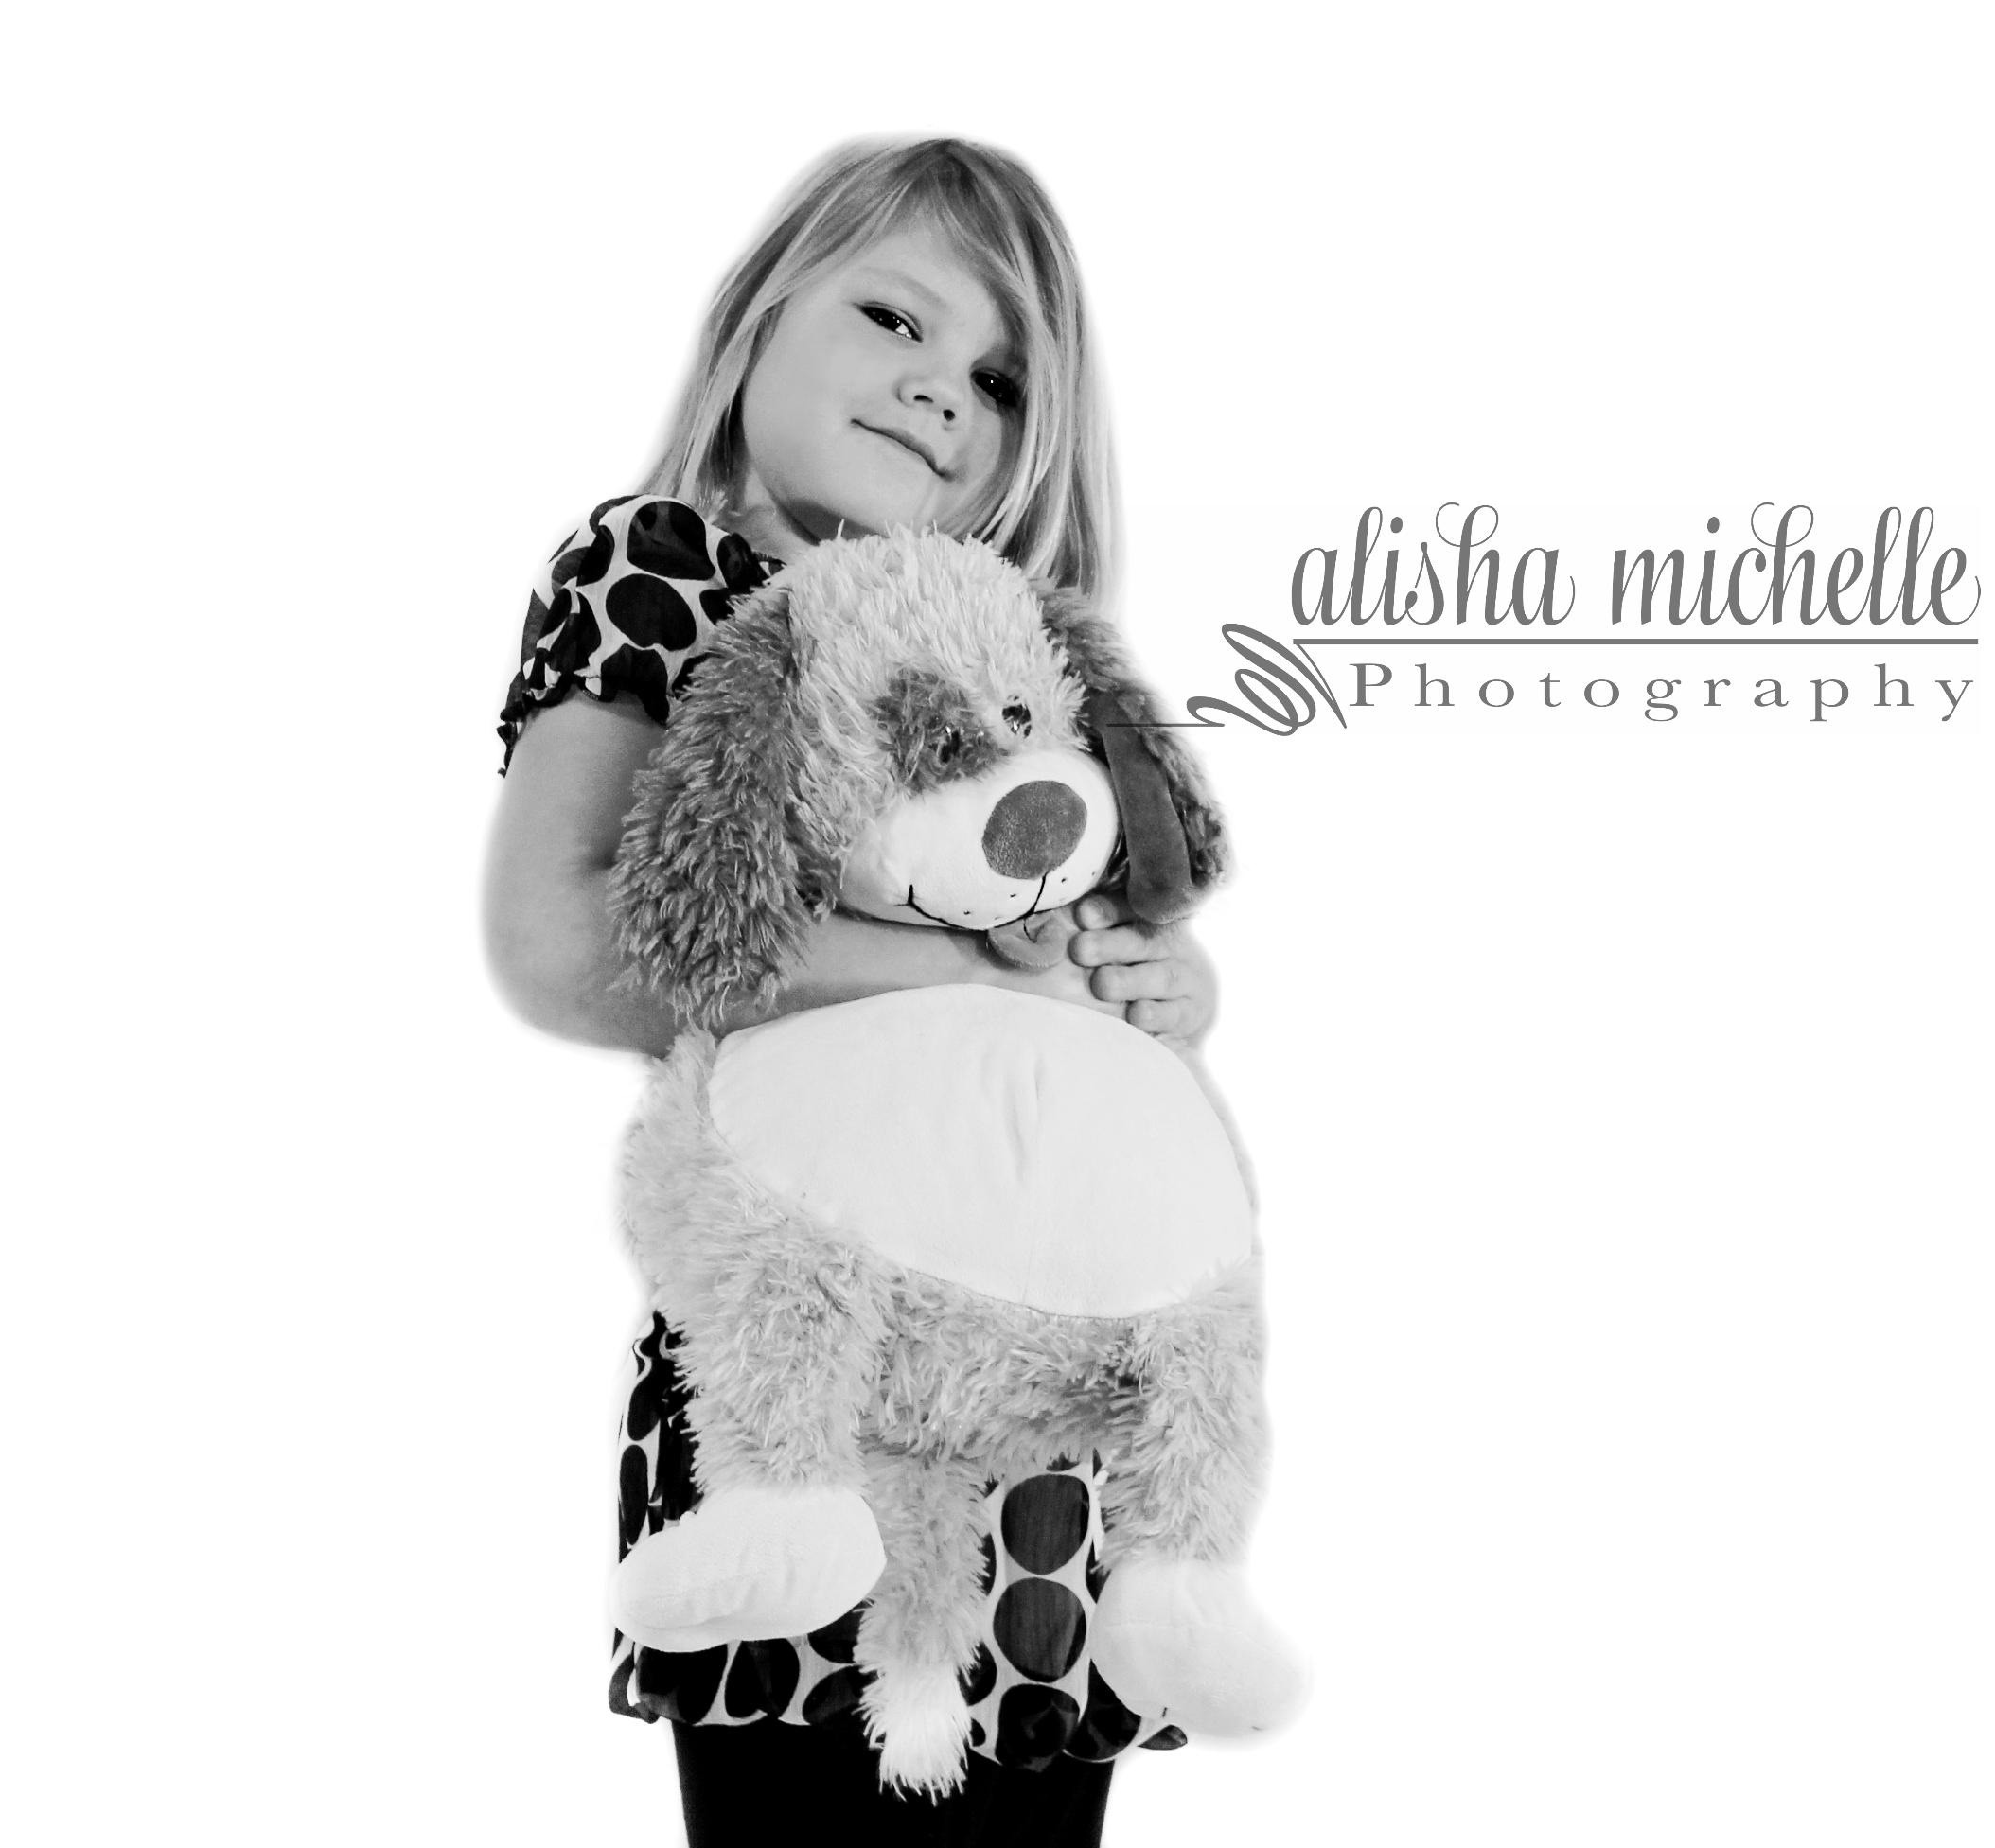 loves her teddybear